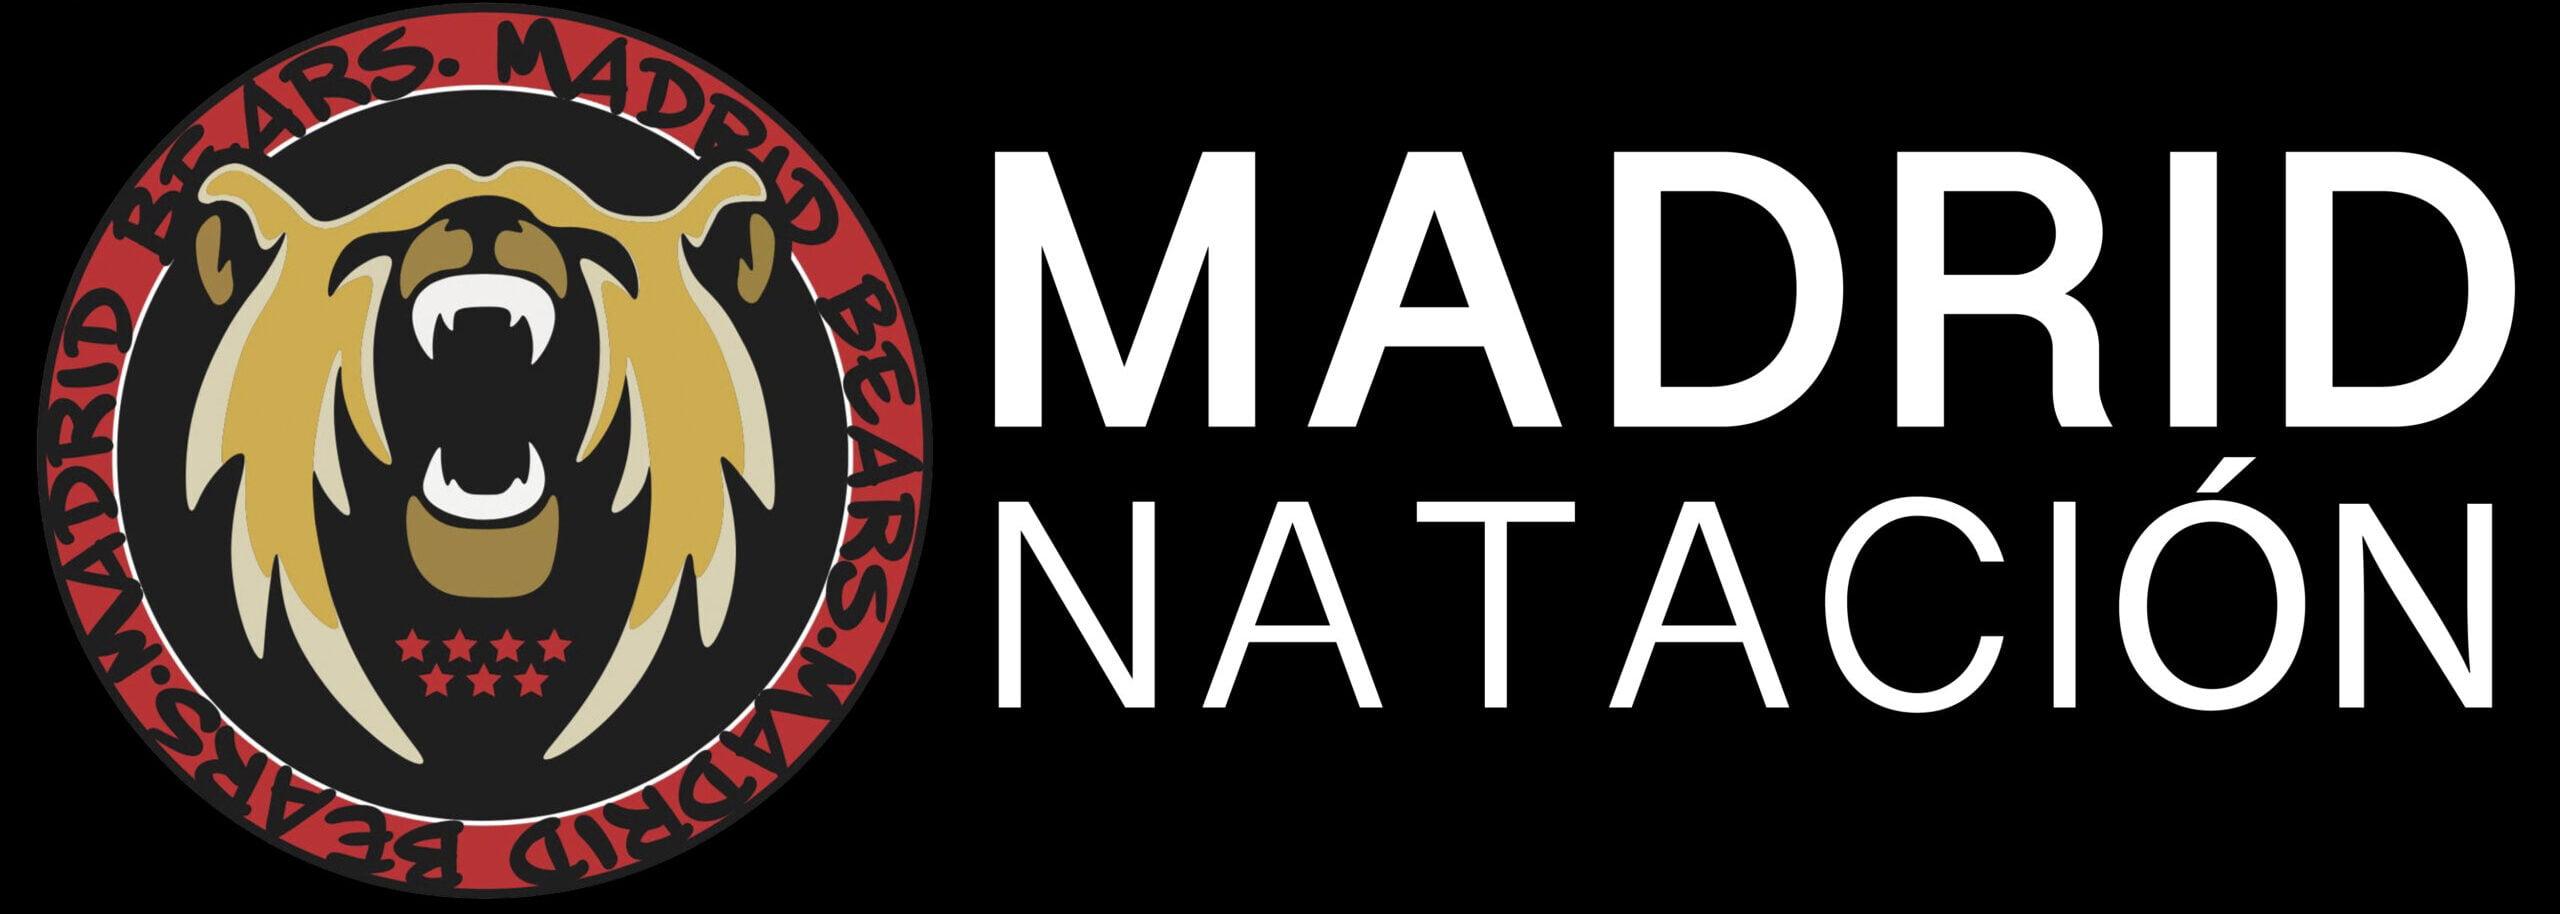 MADRID NATACIÓN BEARS